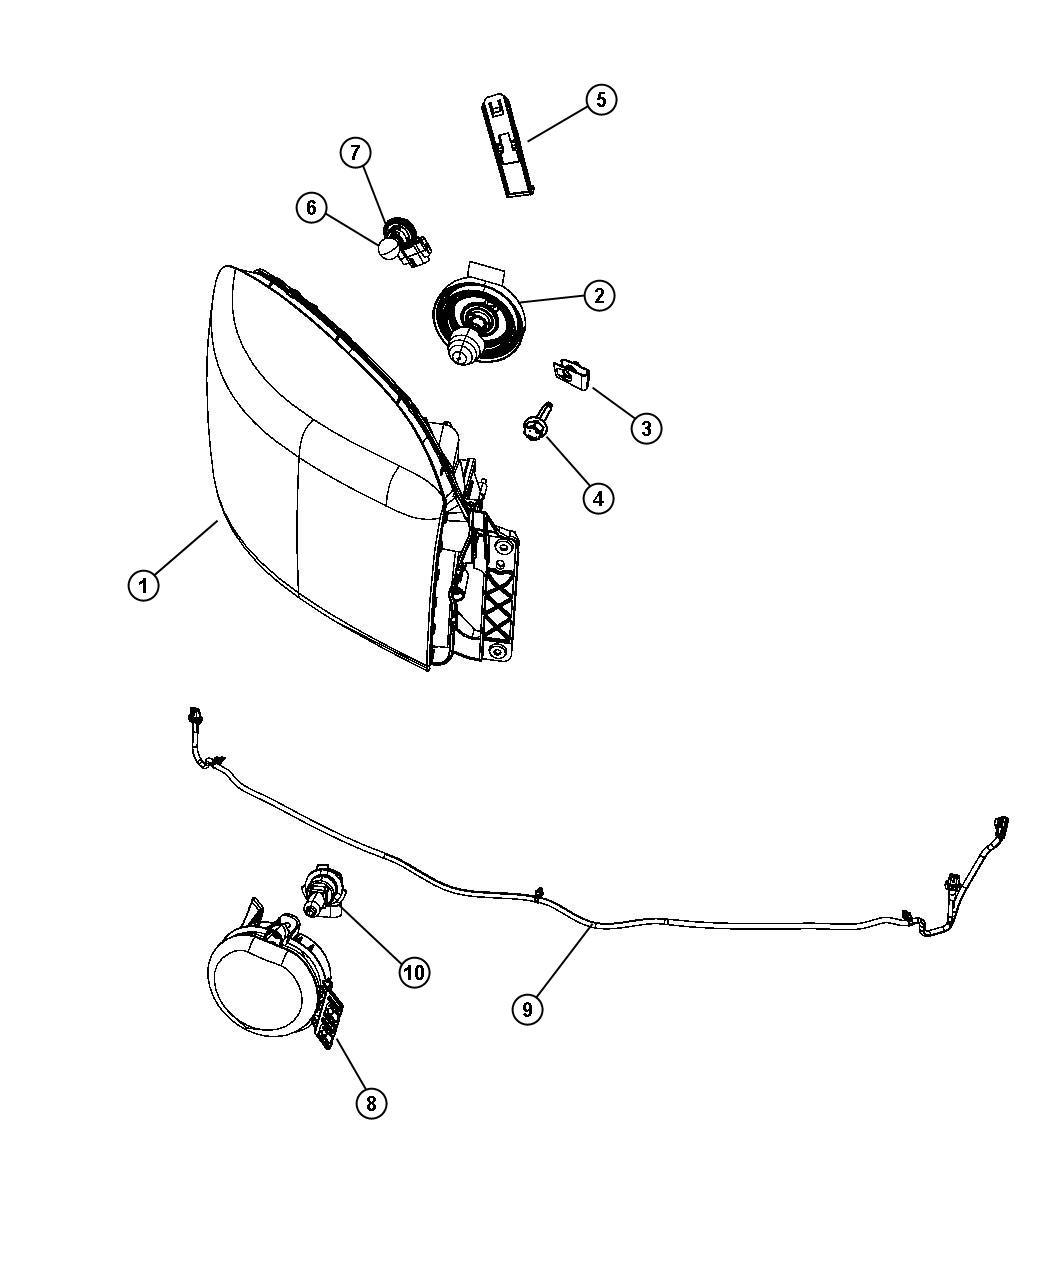 2012 Dodge Ram 3500 Wiring. Fog lamp jumper. Apd